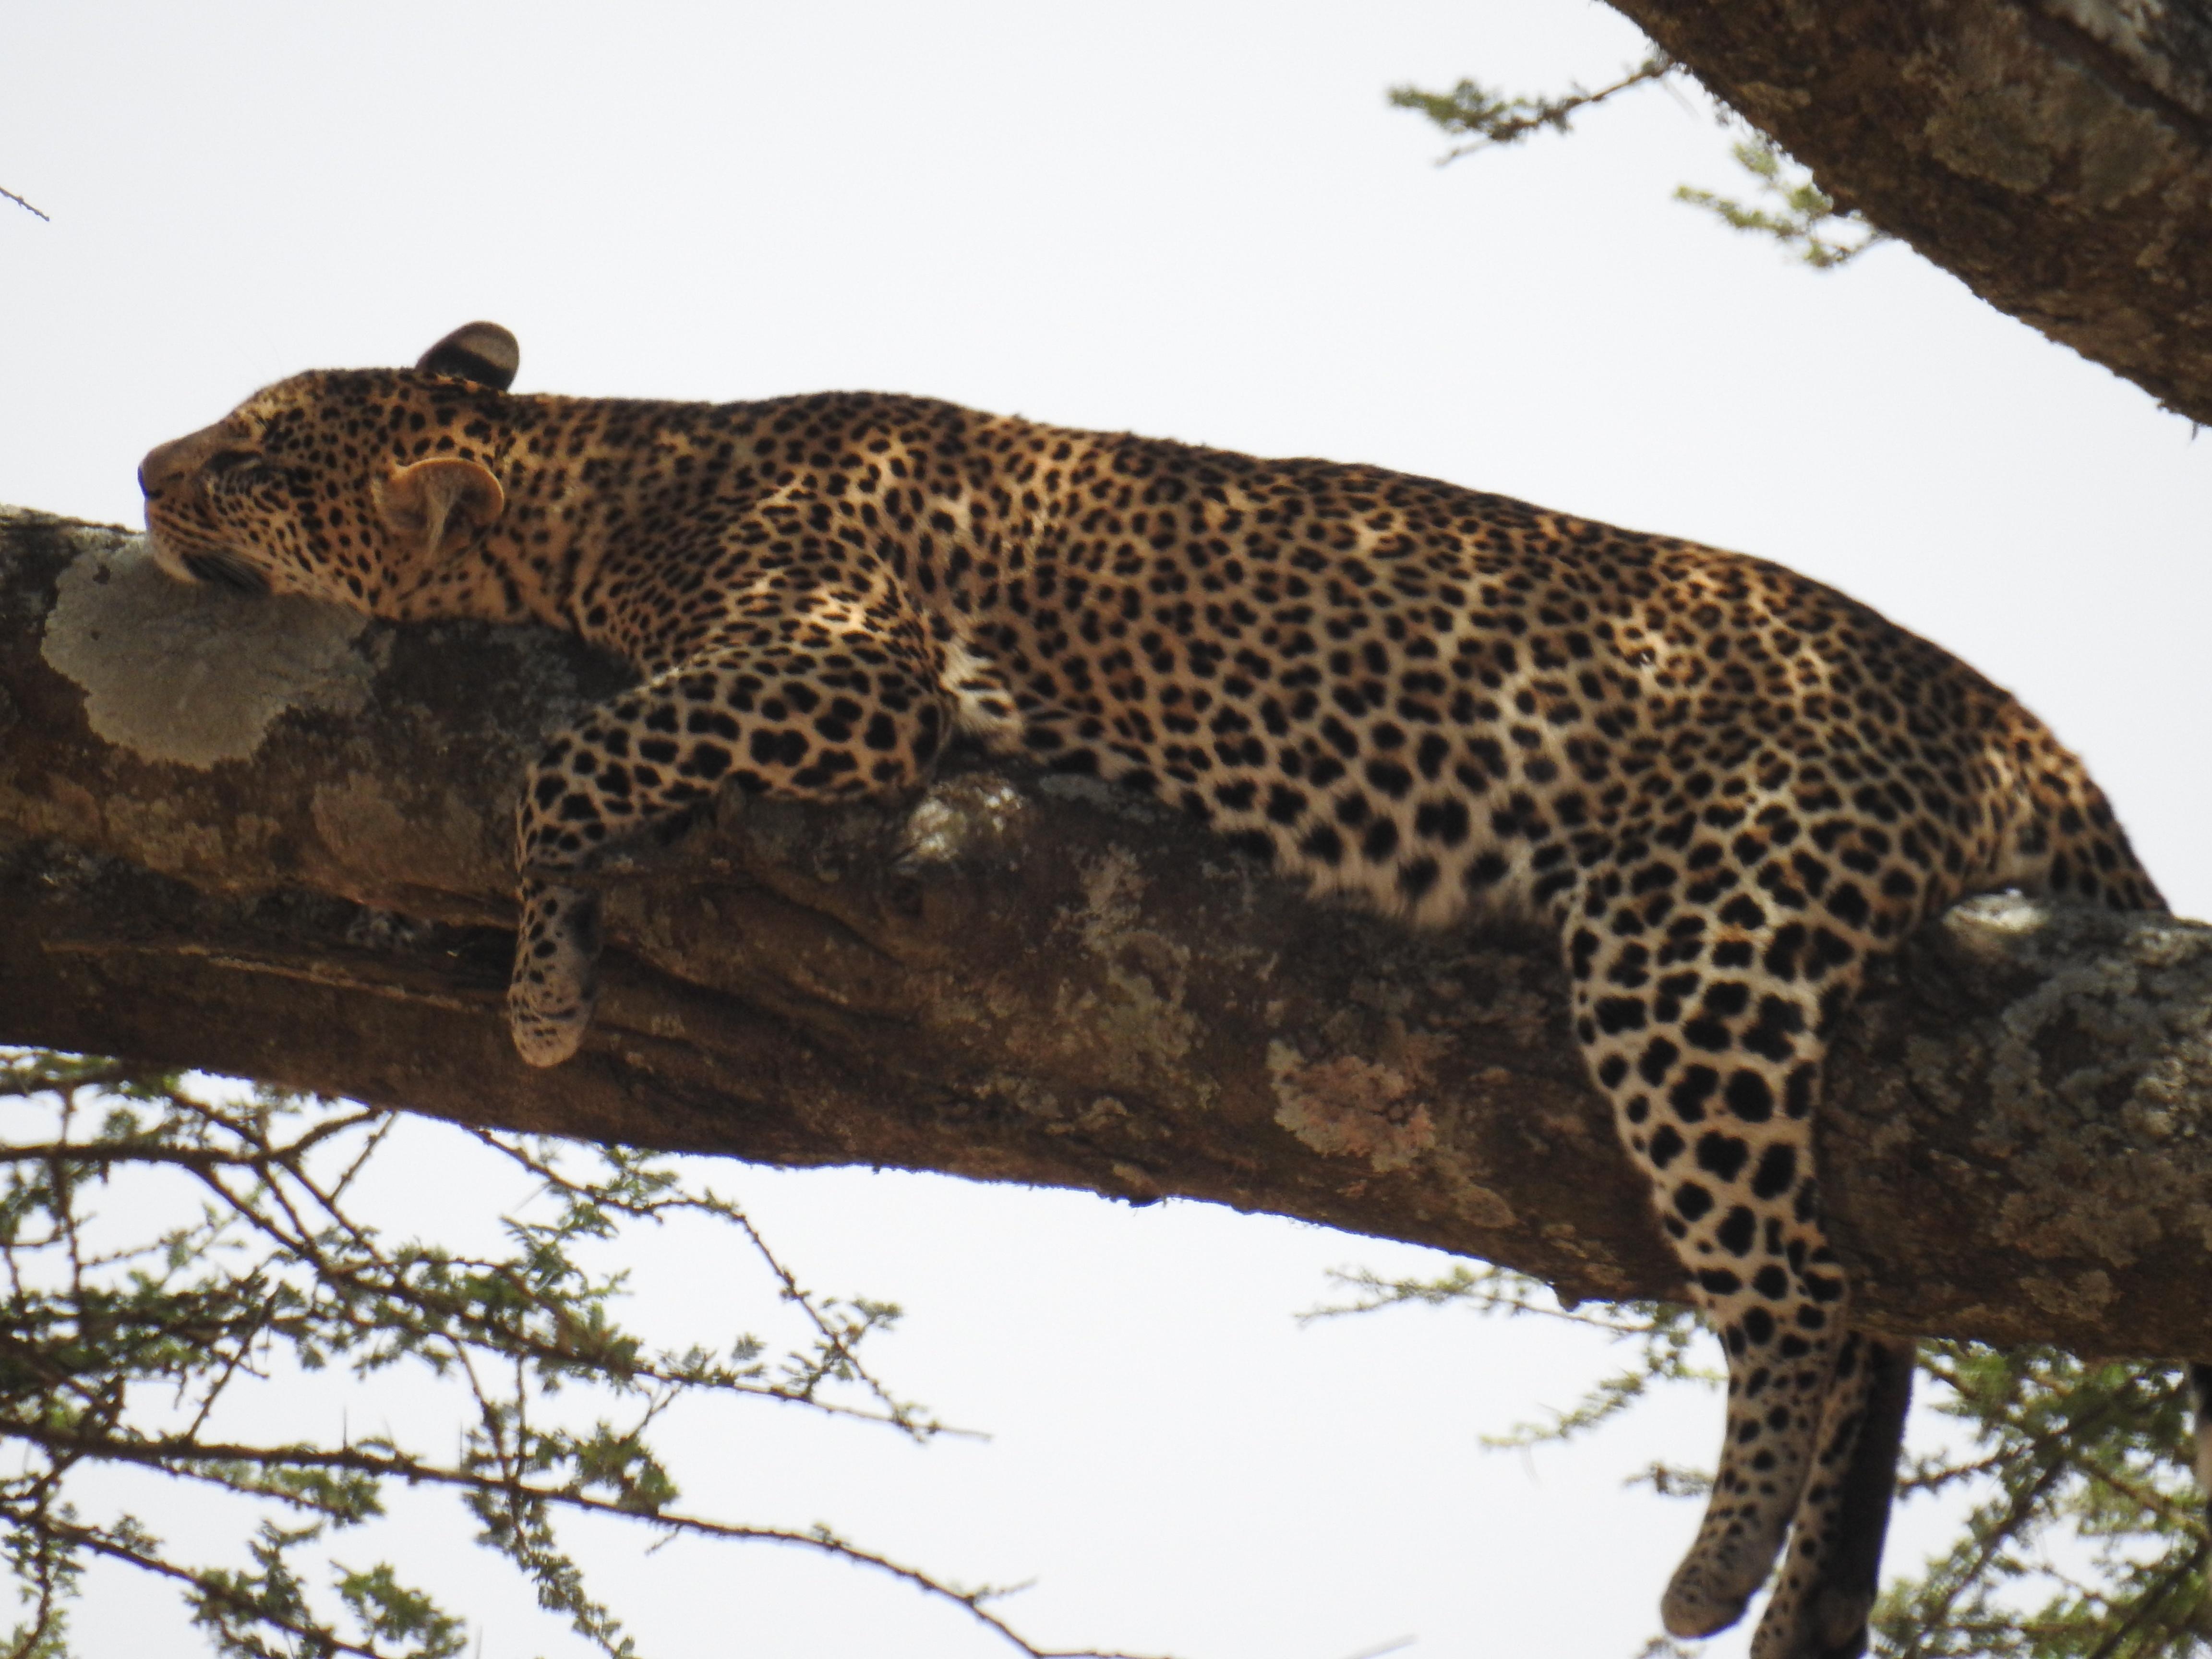 Leopard_lt_med2.jpg